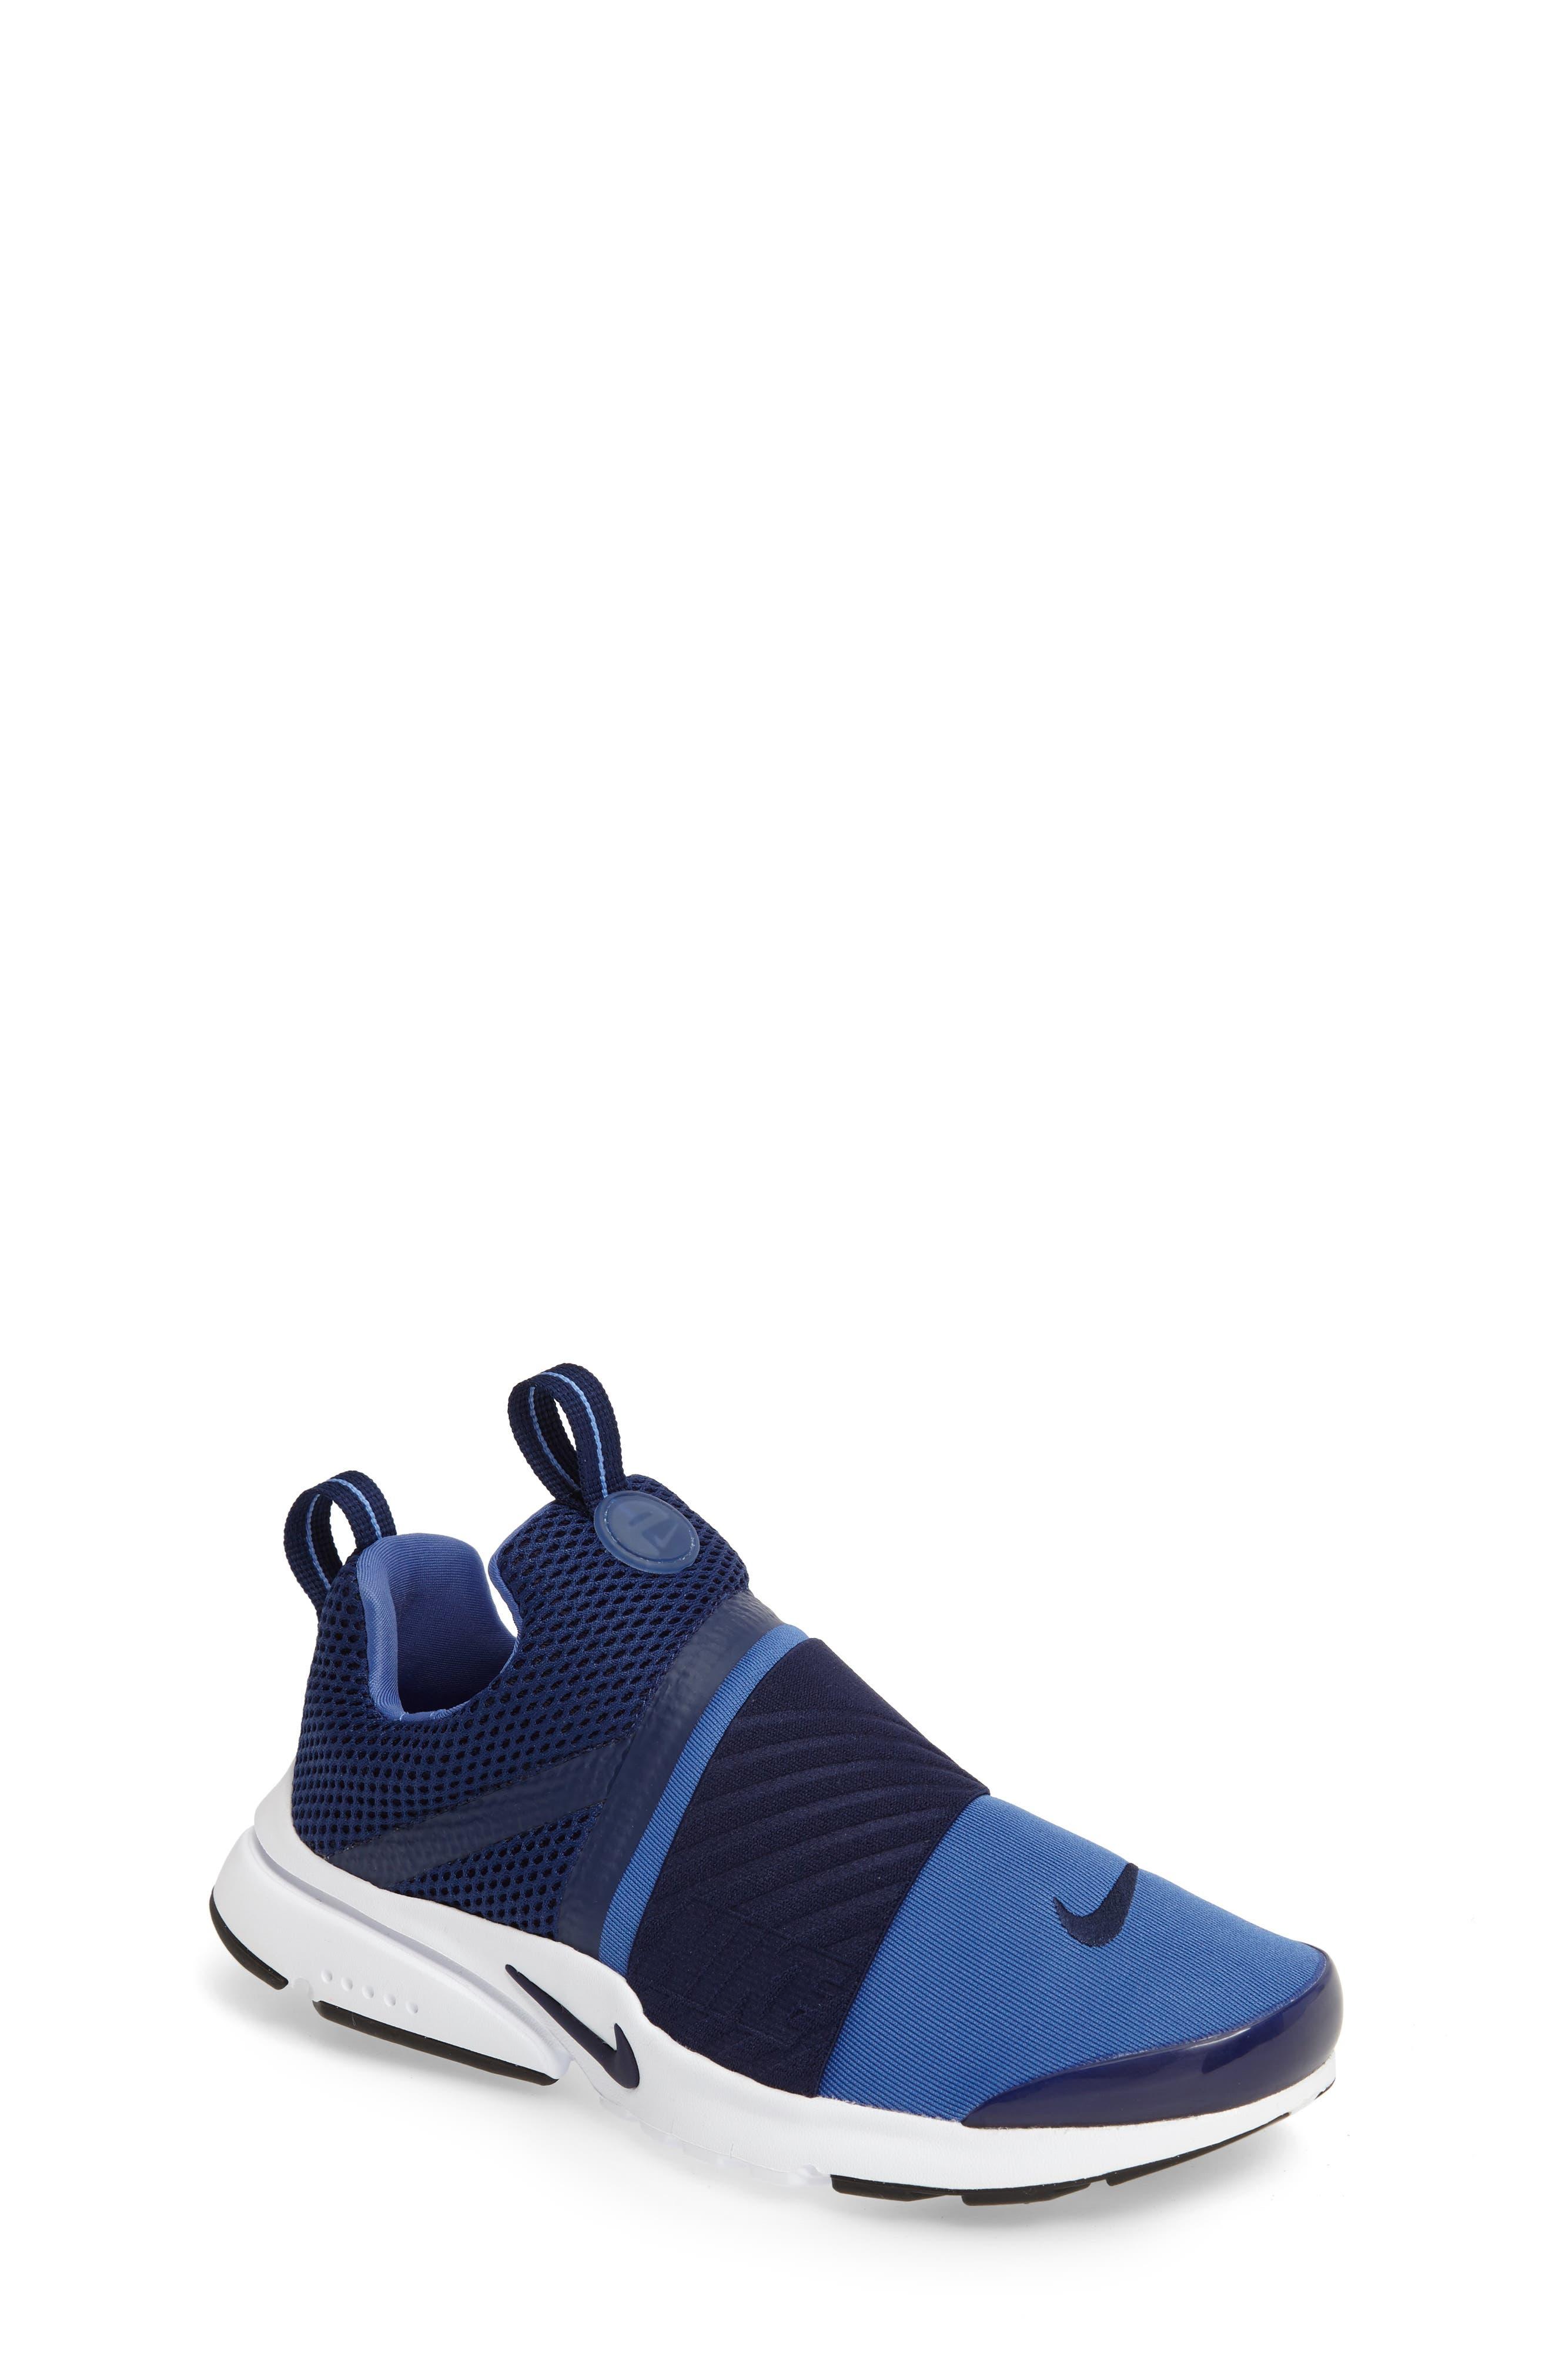 Presto Extreme Sneaker,                             Main thumbnail 8, color,